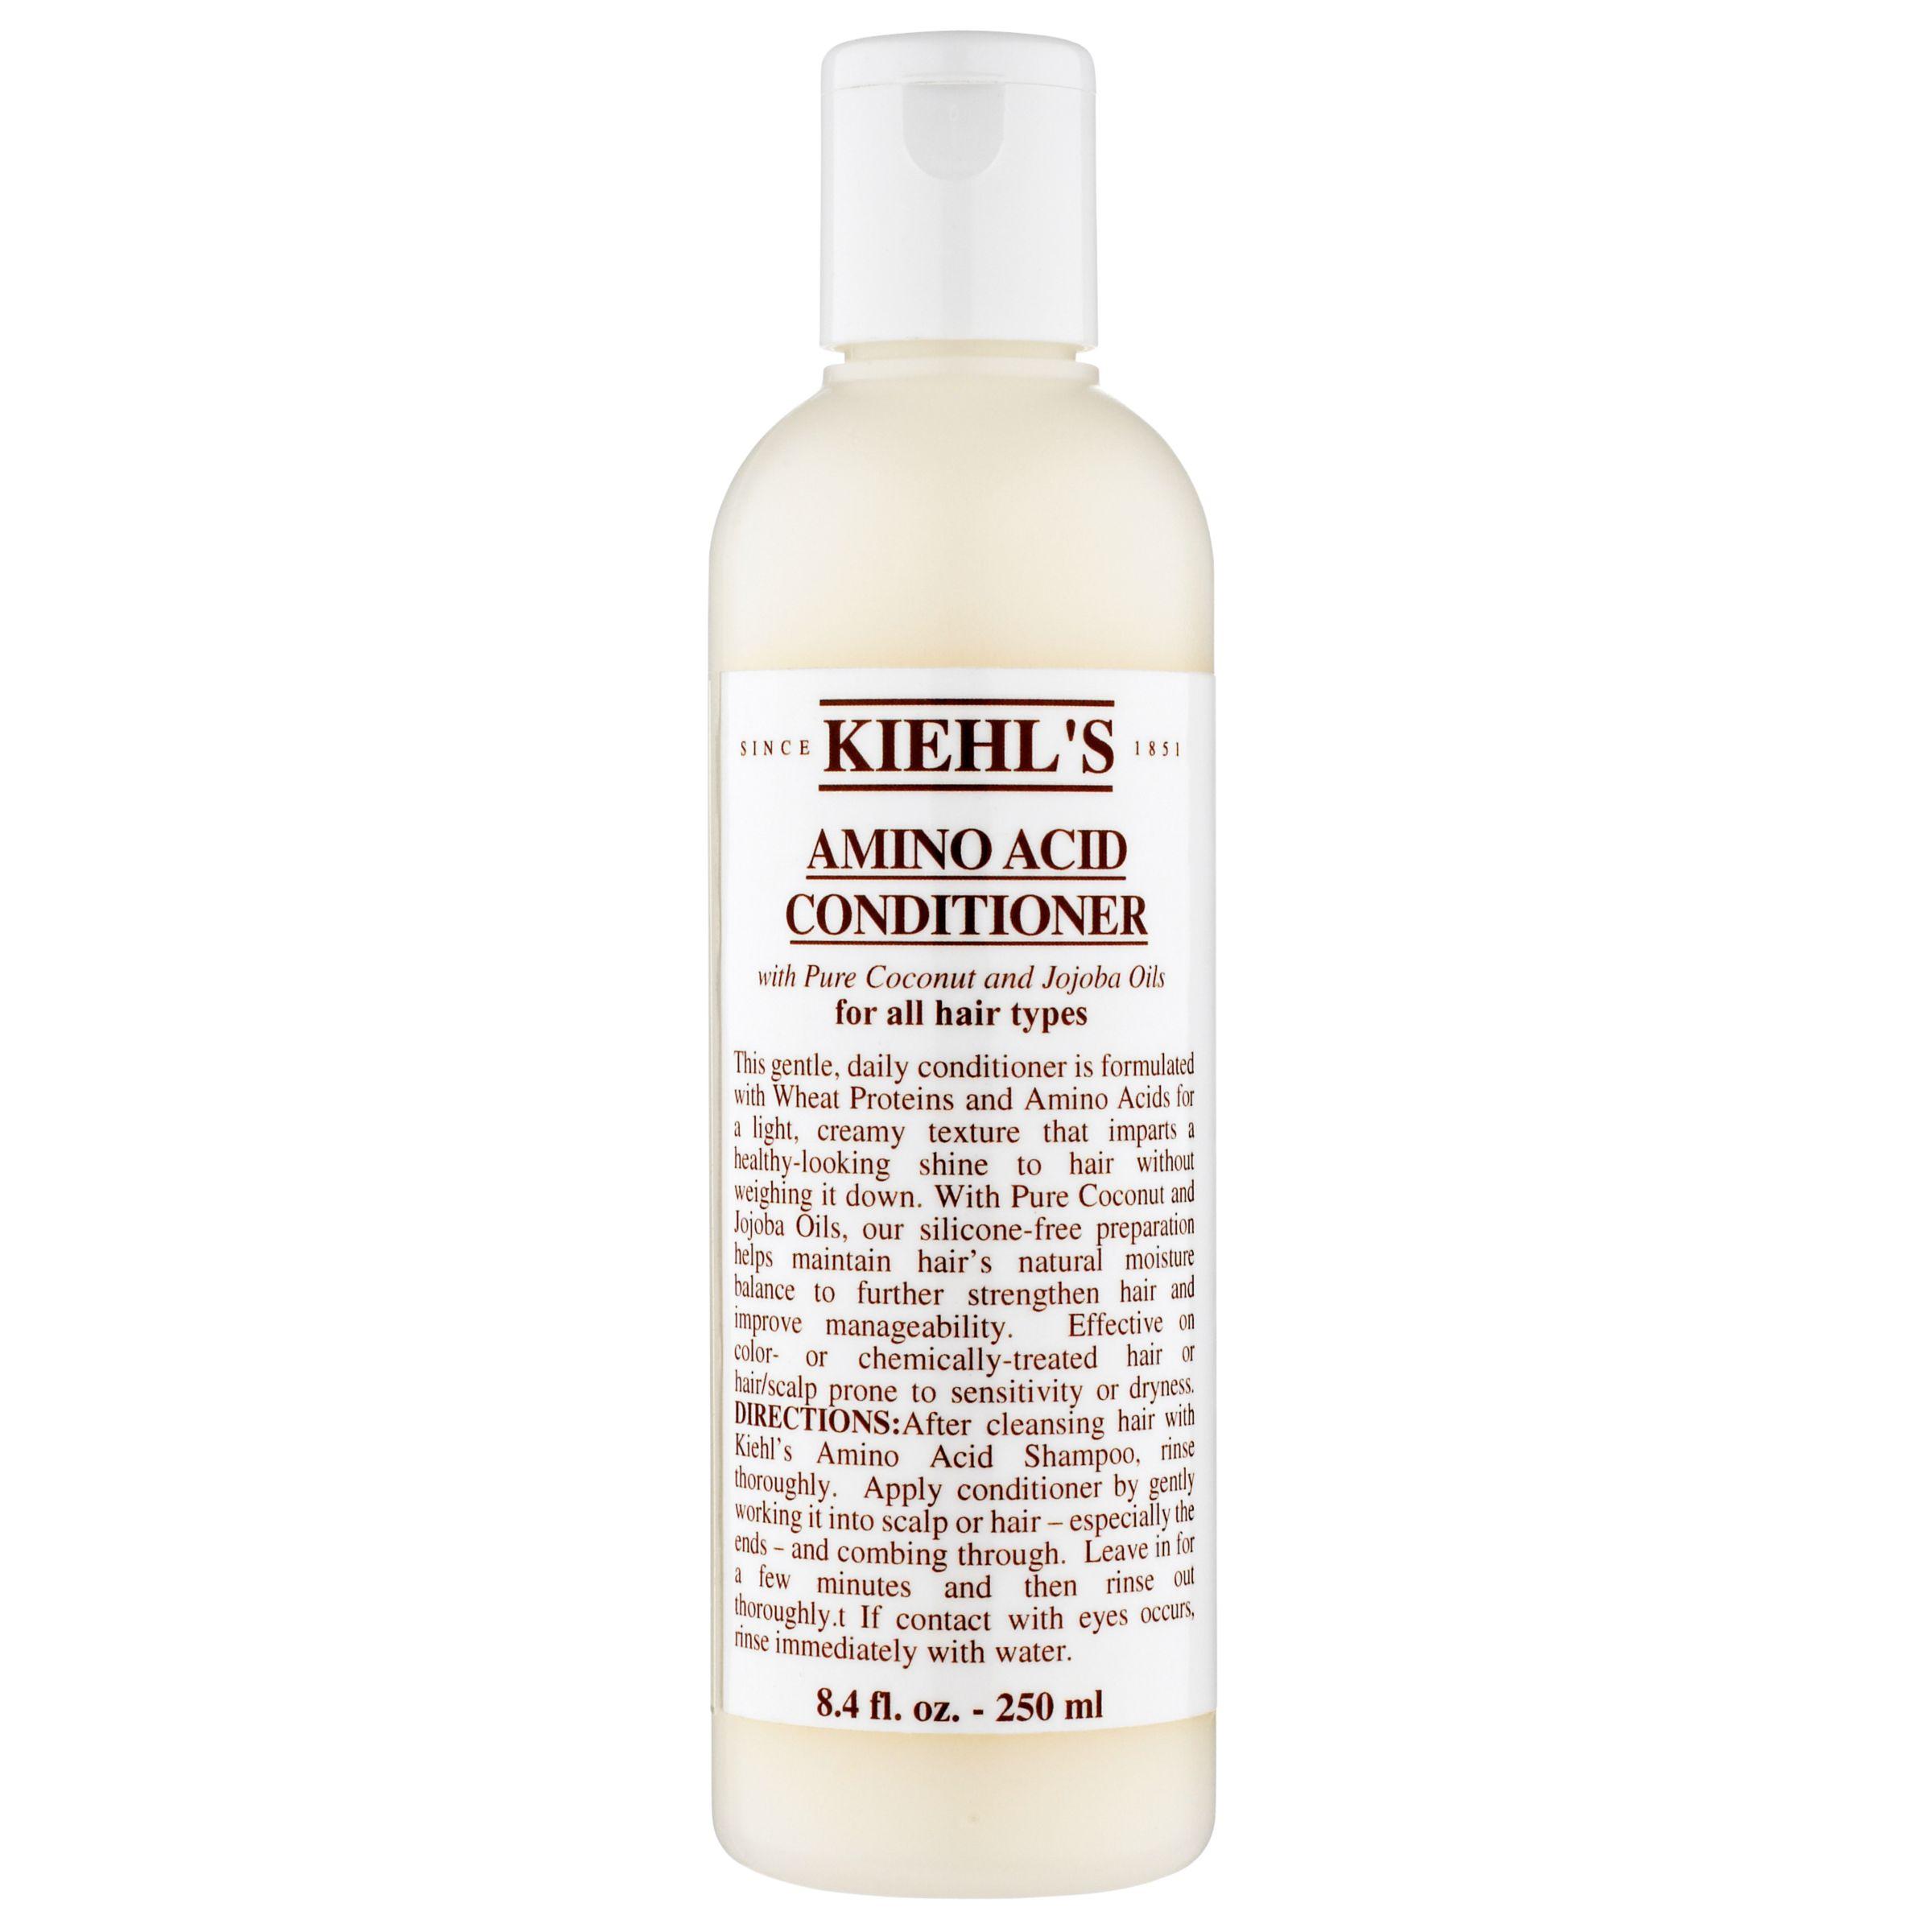 Kiehls Kiehl's Amino Acid Conditioner, 200ml